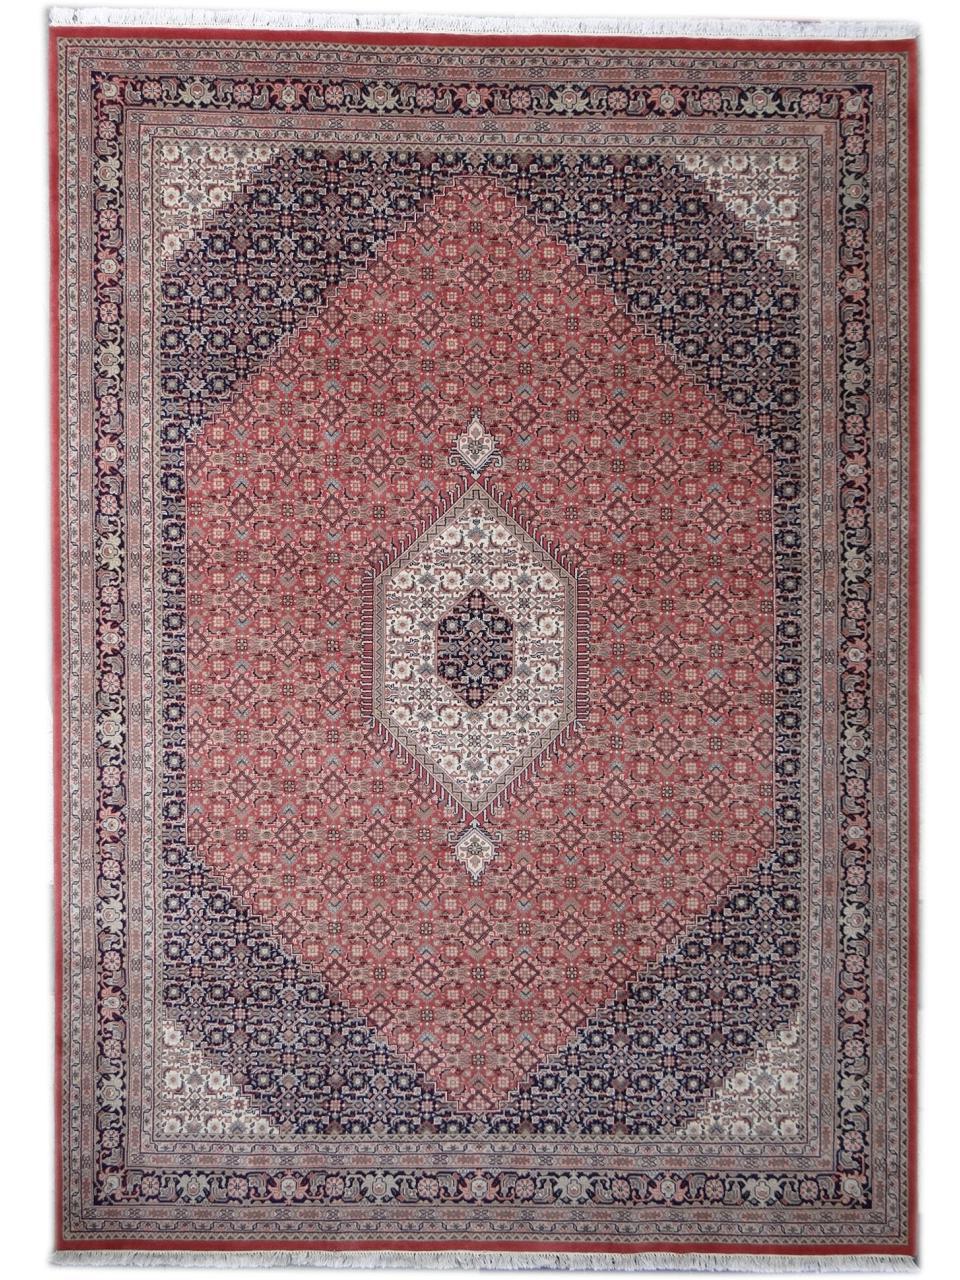 Classic rugs - Bidjar-Majestic-002 2700